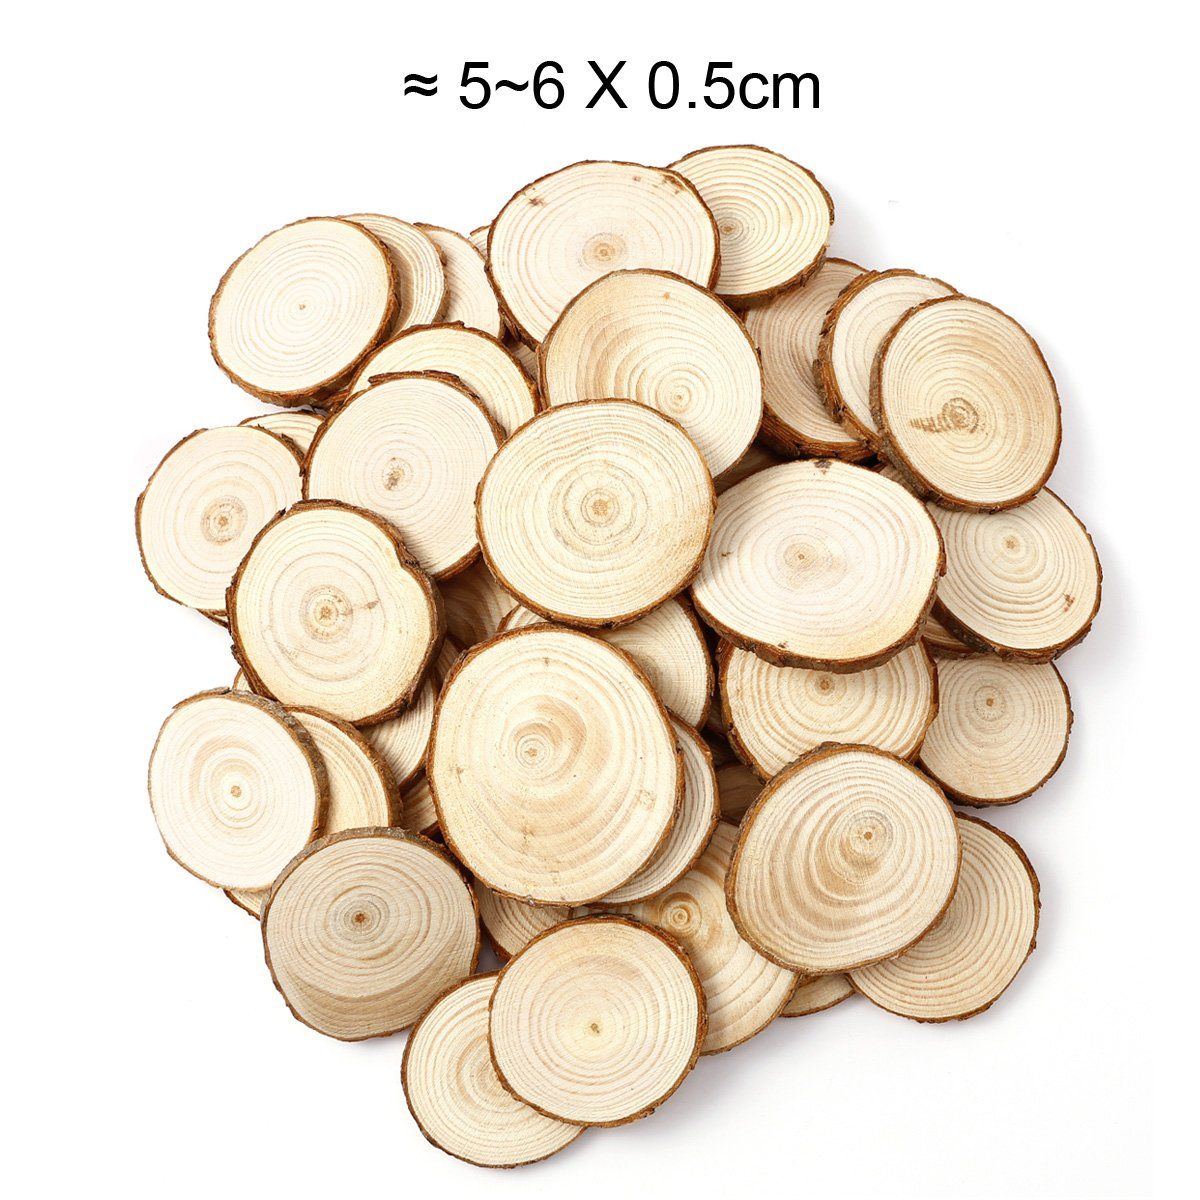 Amazon.com: 50x Natural Wood Pine Tree Slice Disc Wedding ...